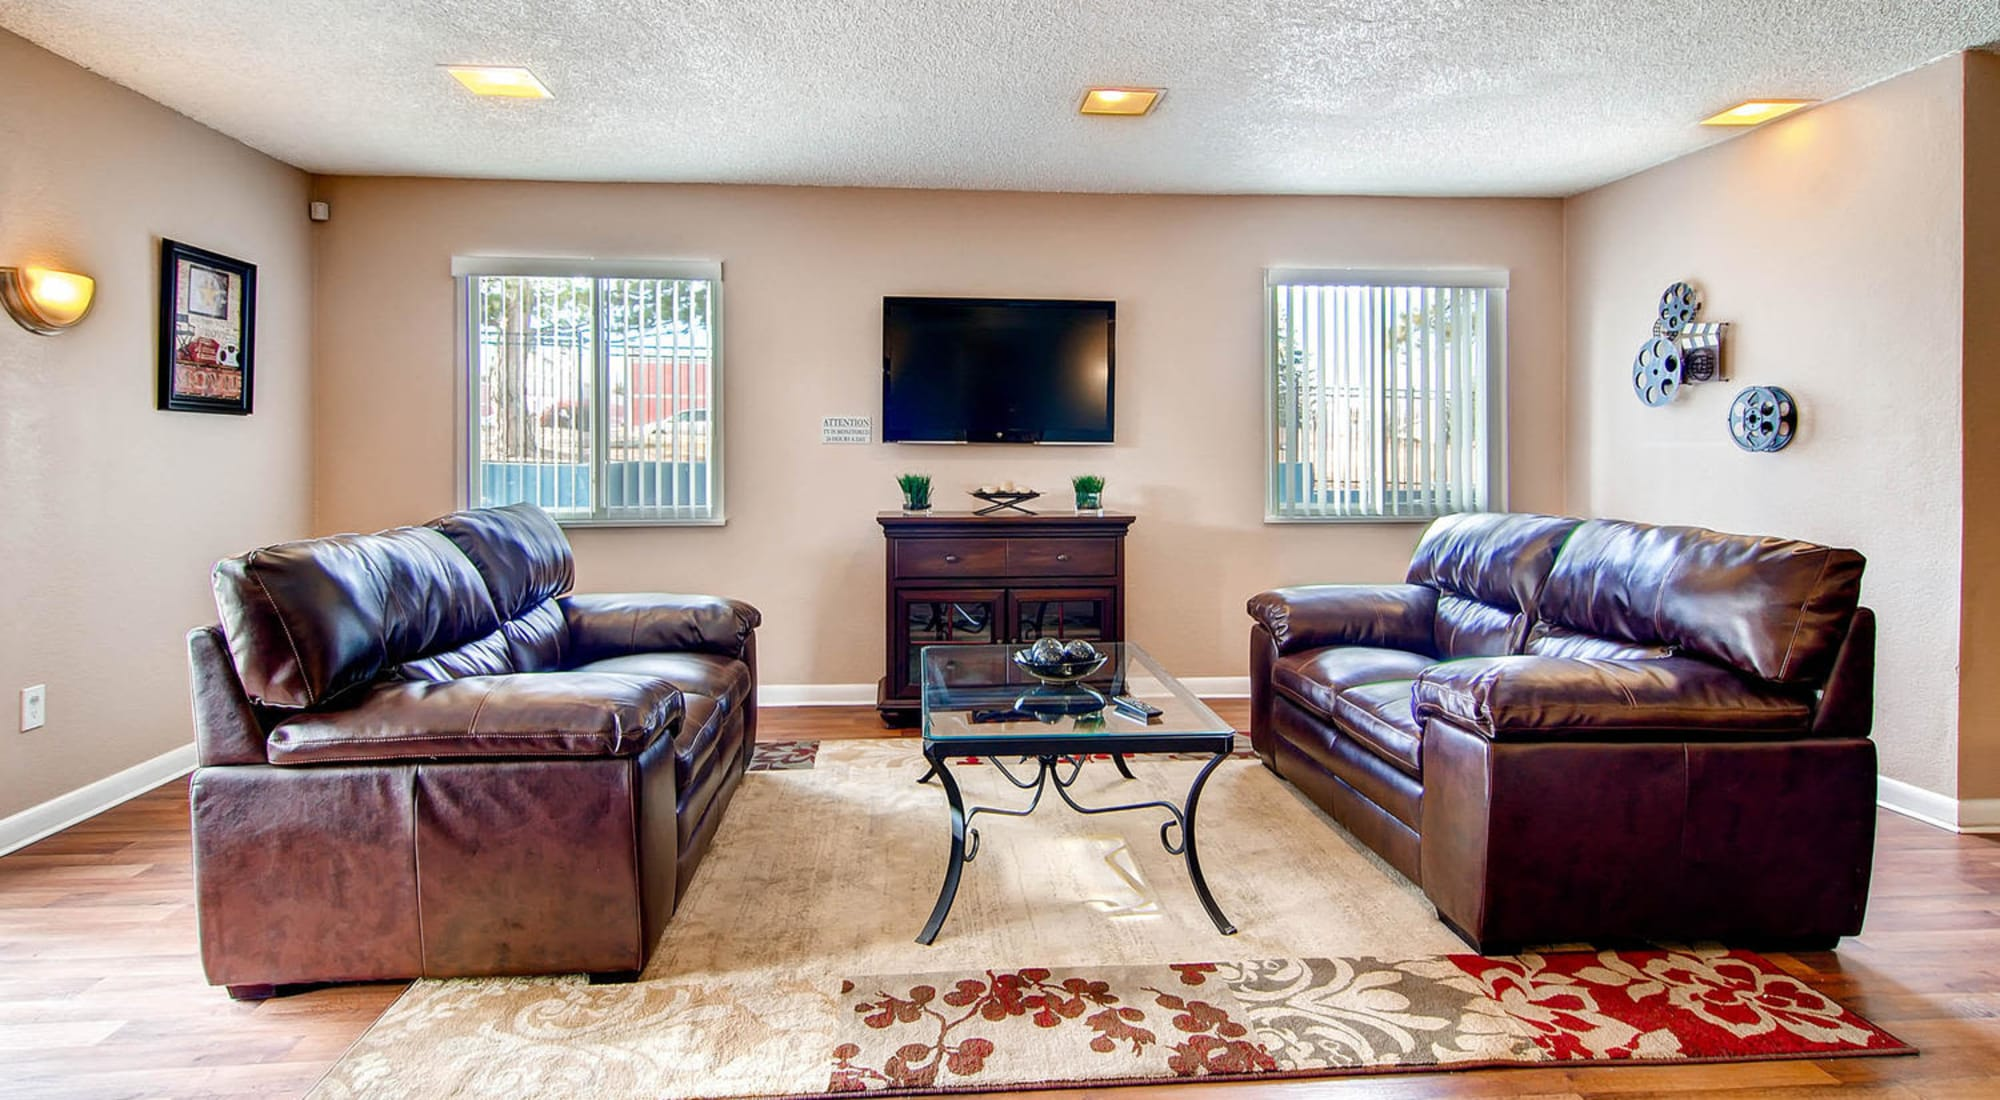 Reviews of Arvada Green Apartment Homes in Arvada, Colorado